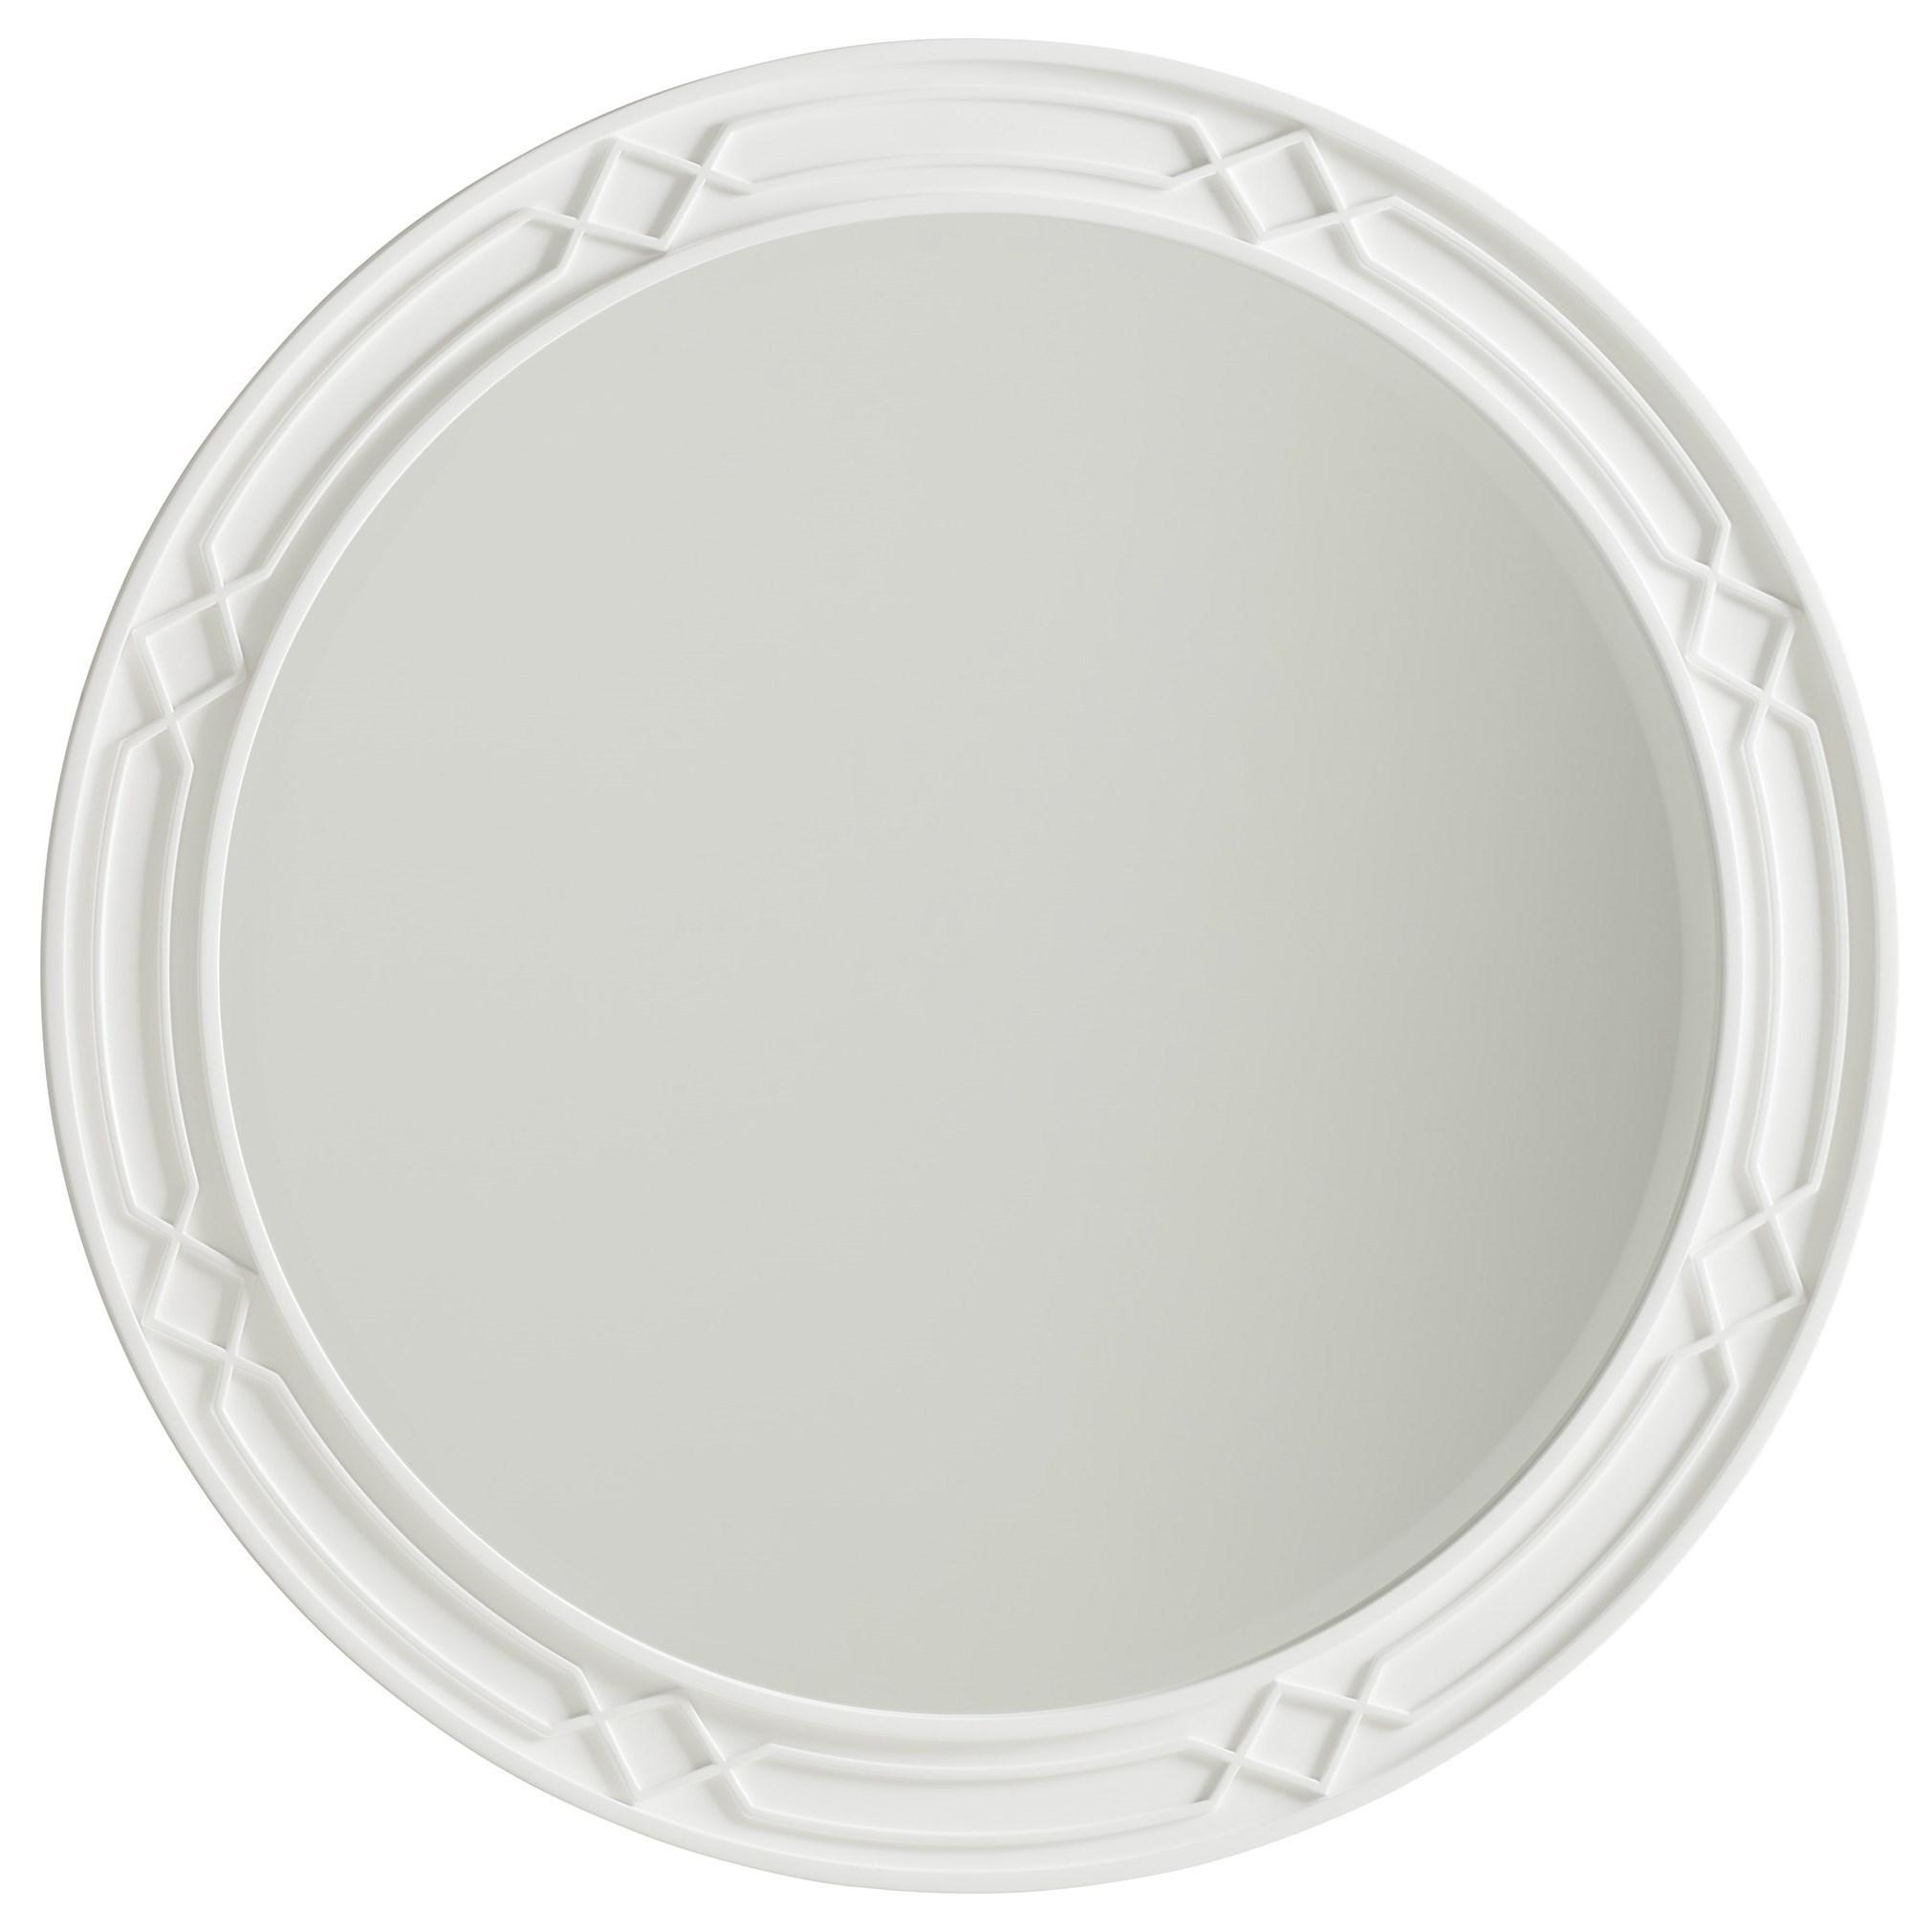 Avondale Carreno Round Mirror by Lexington at Baer's Furniture